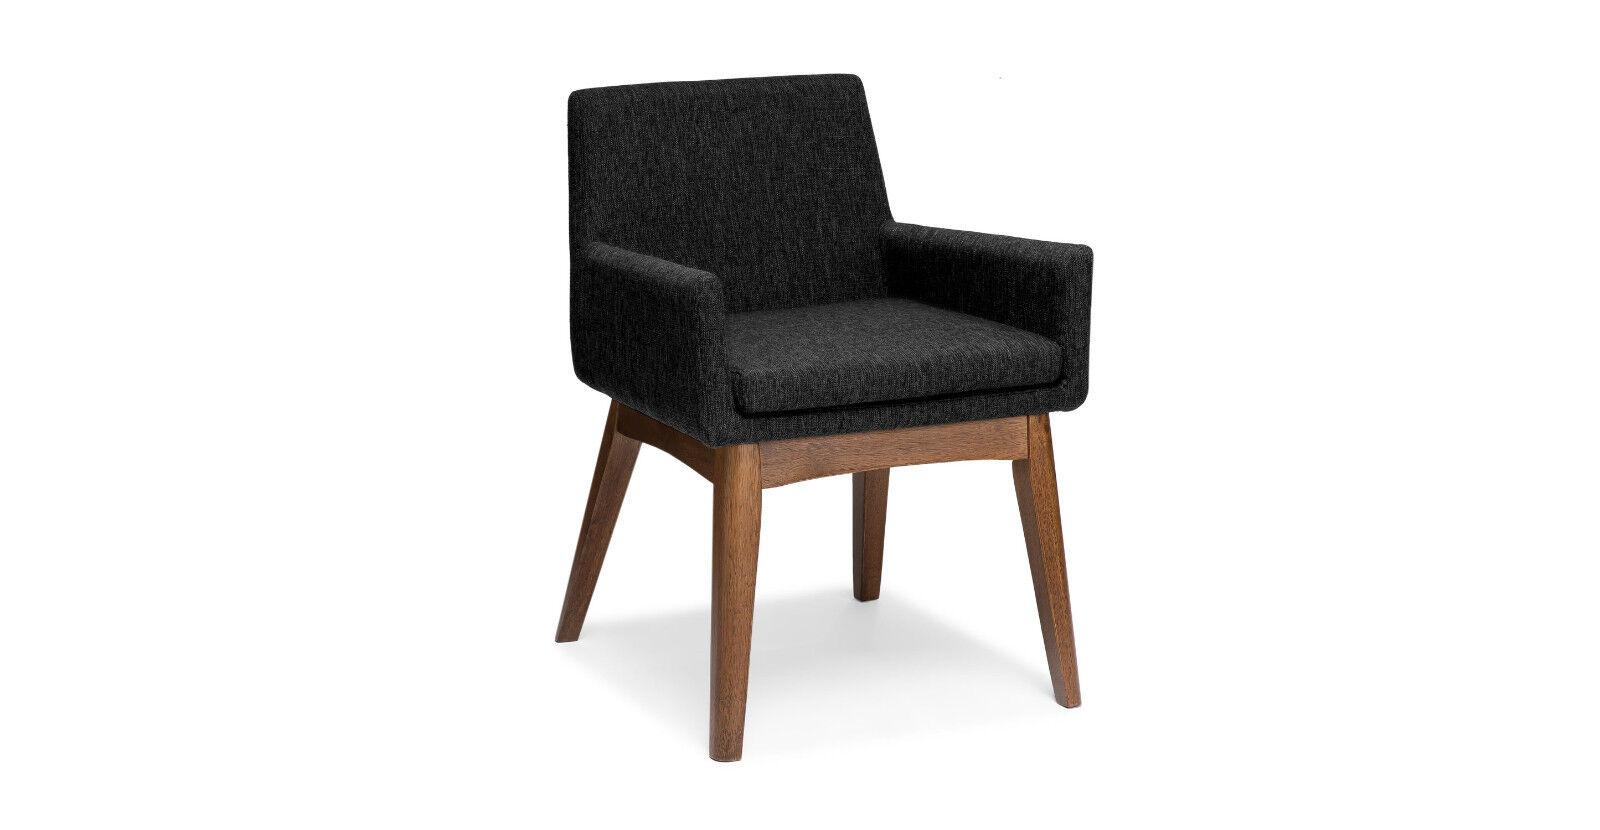 modern low back sofas foam flip sofa canada mid century dining chair w arms